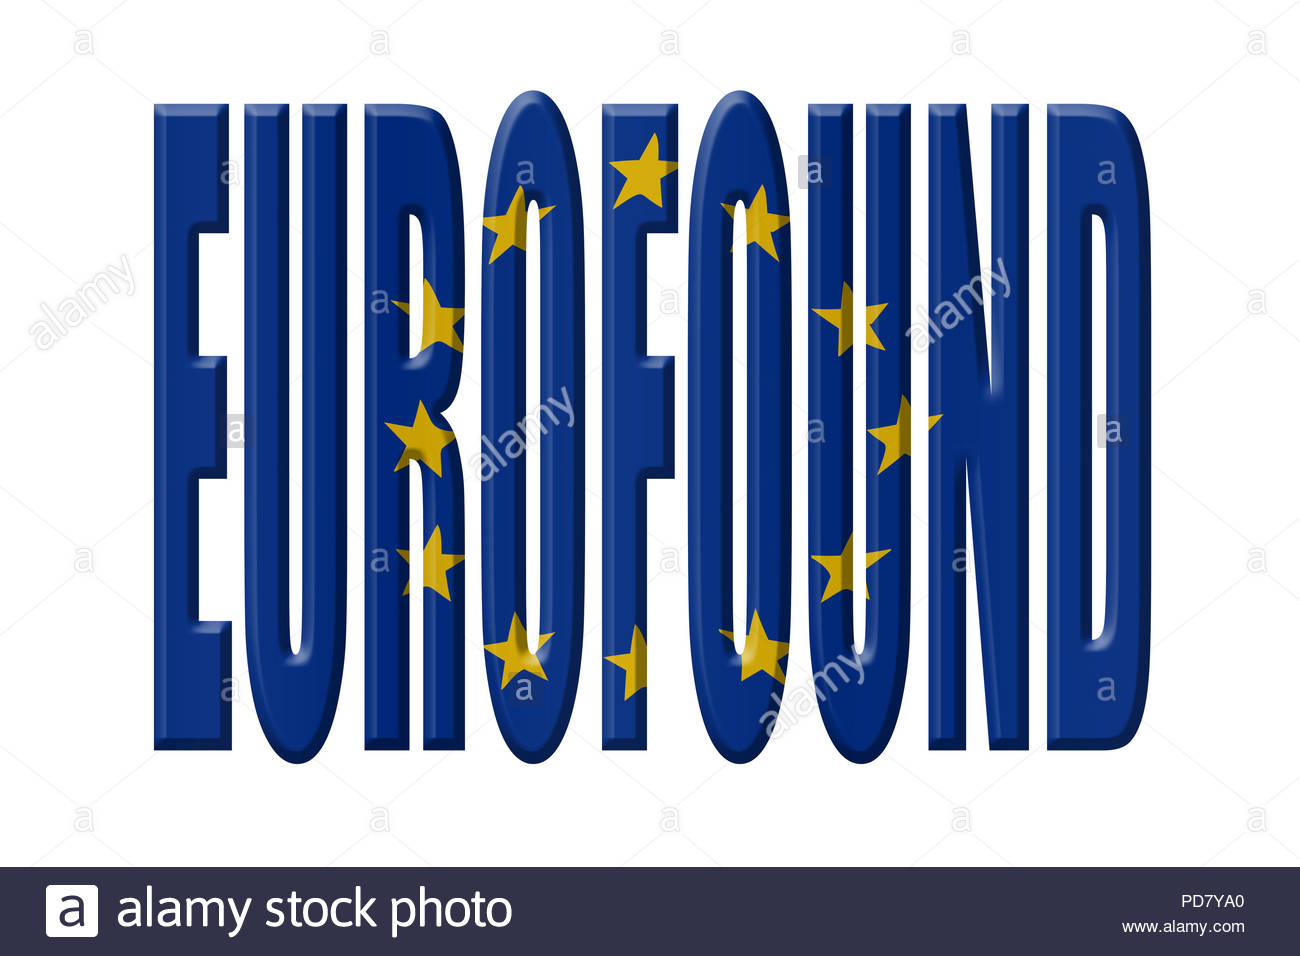 Digital Illustration - EU agency. EUROFOUND European Foundation for the Improvement of Living and Working Conditions,Europäische Stiftung zur Verbesse - Stock Image